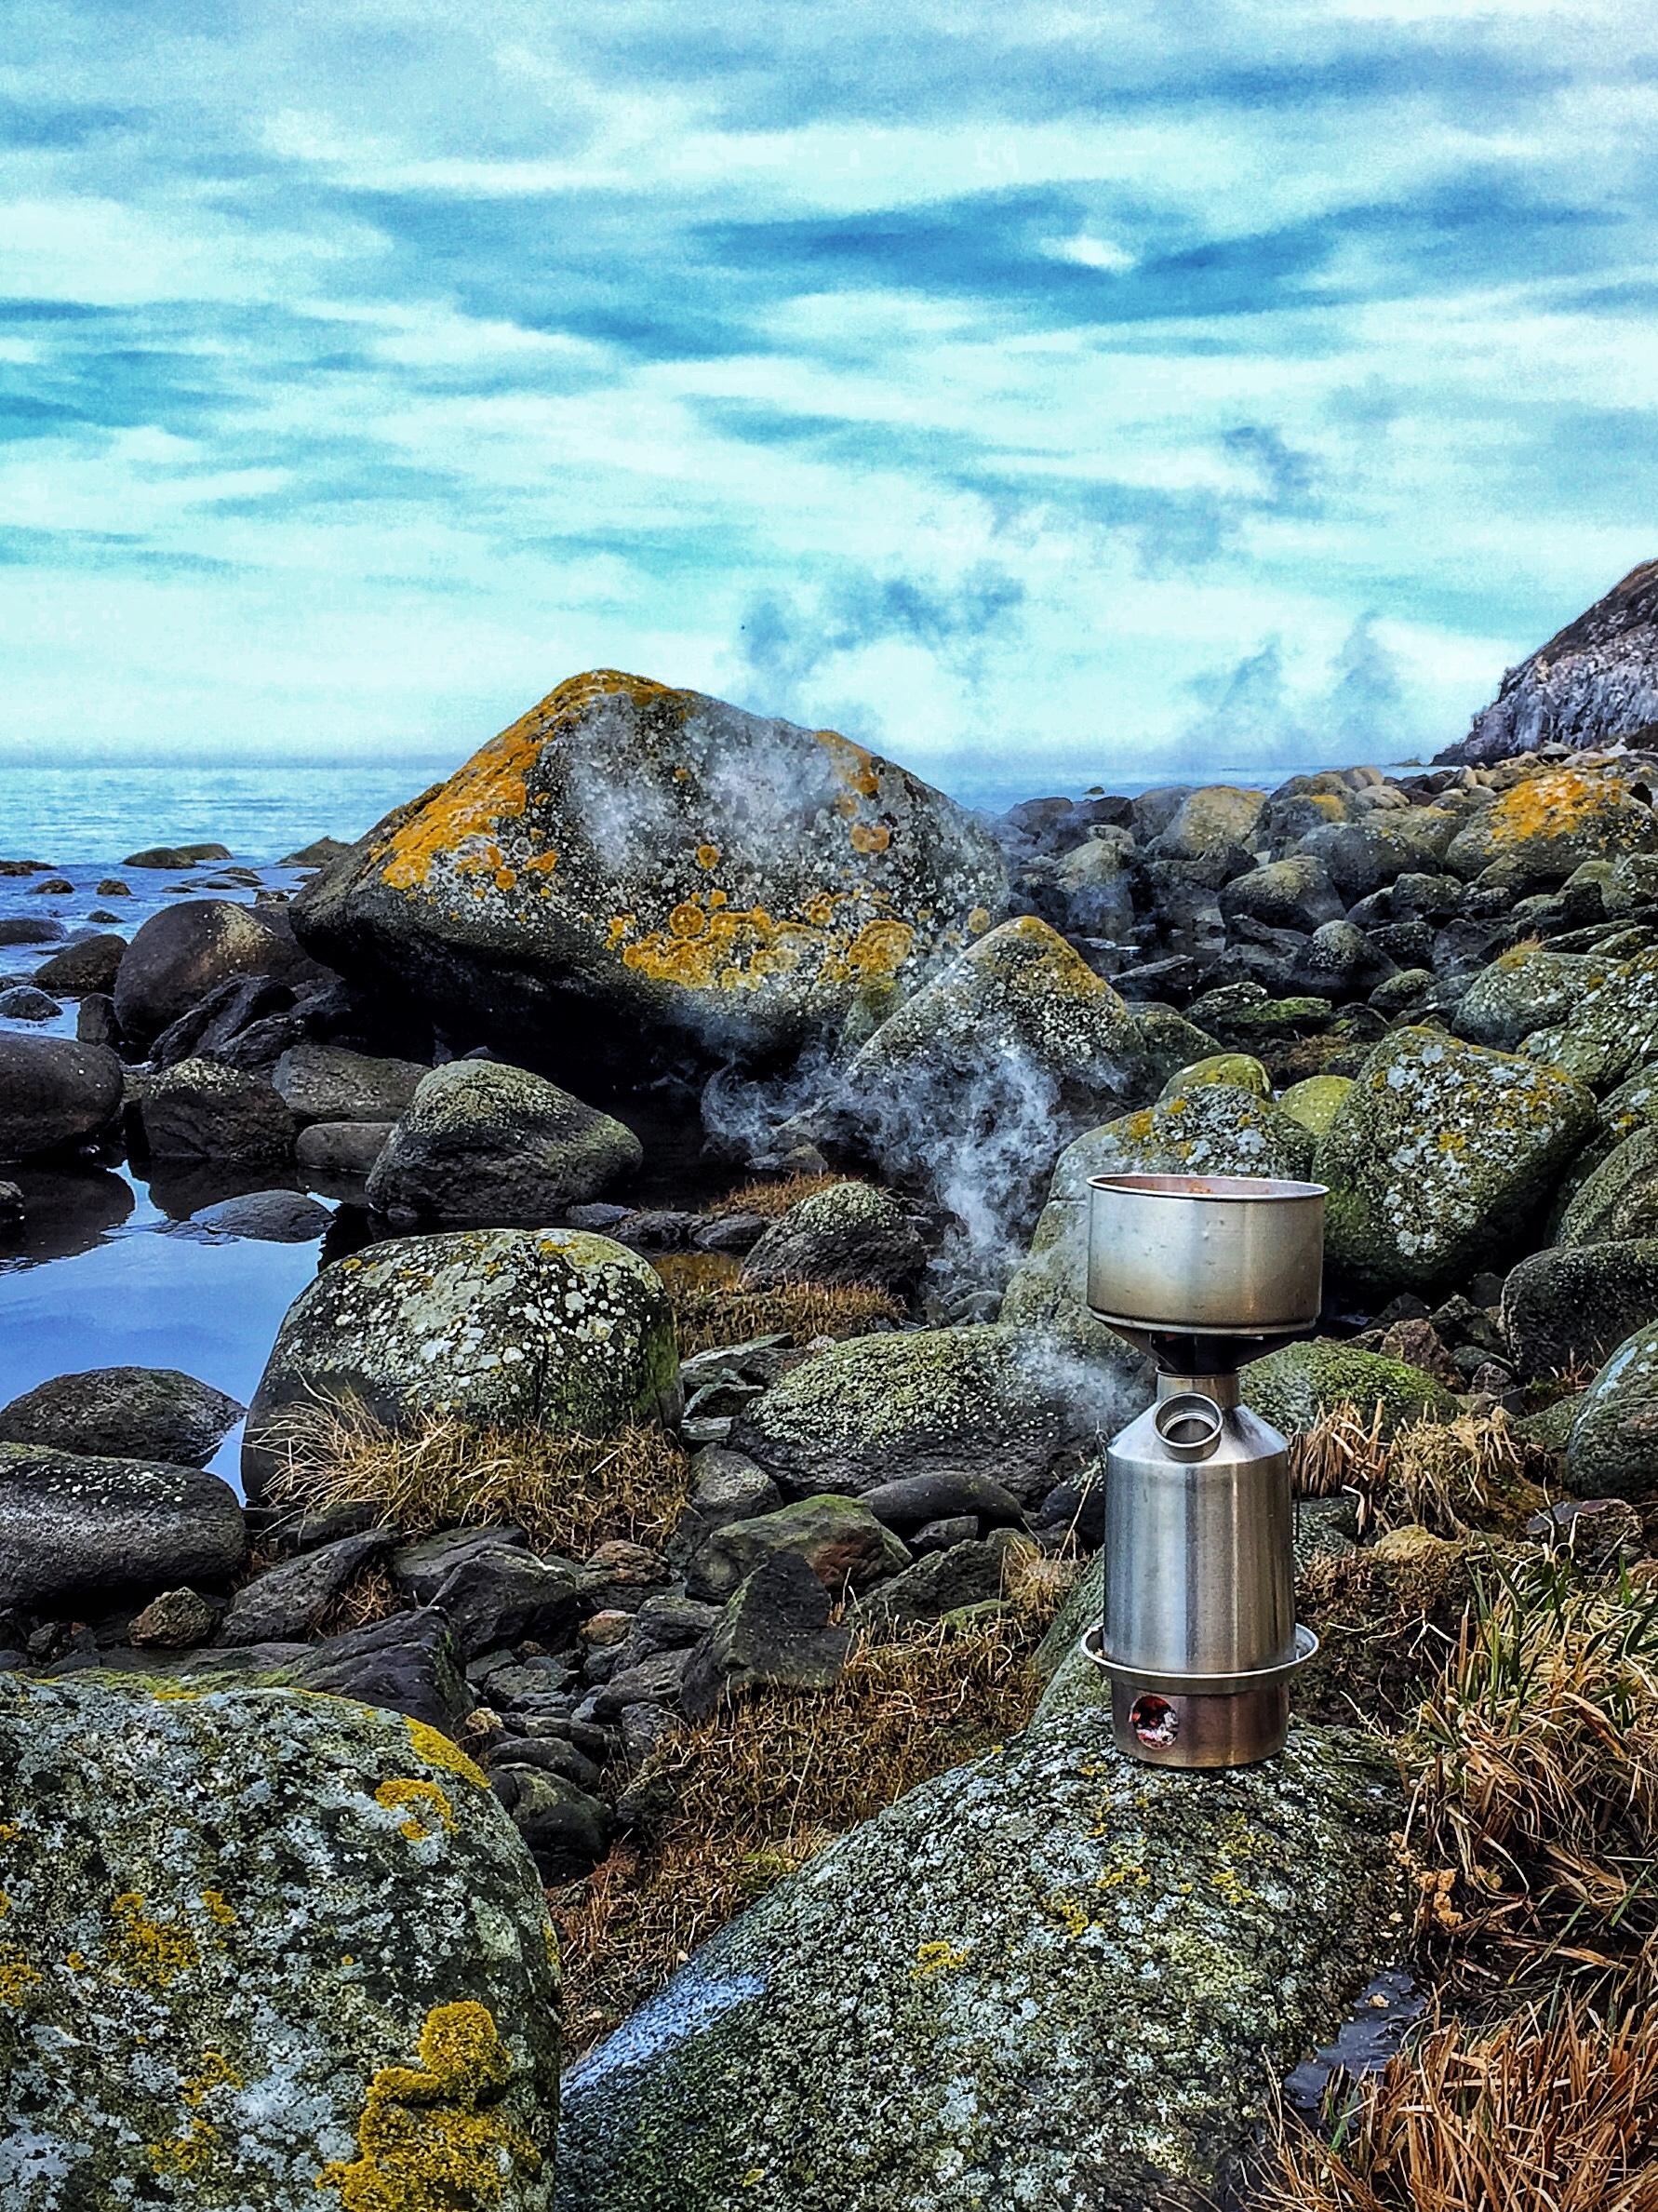 Bornholm's northern coast consists of raw rocks